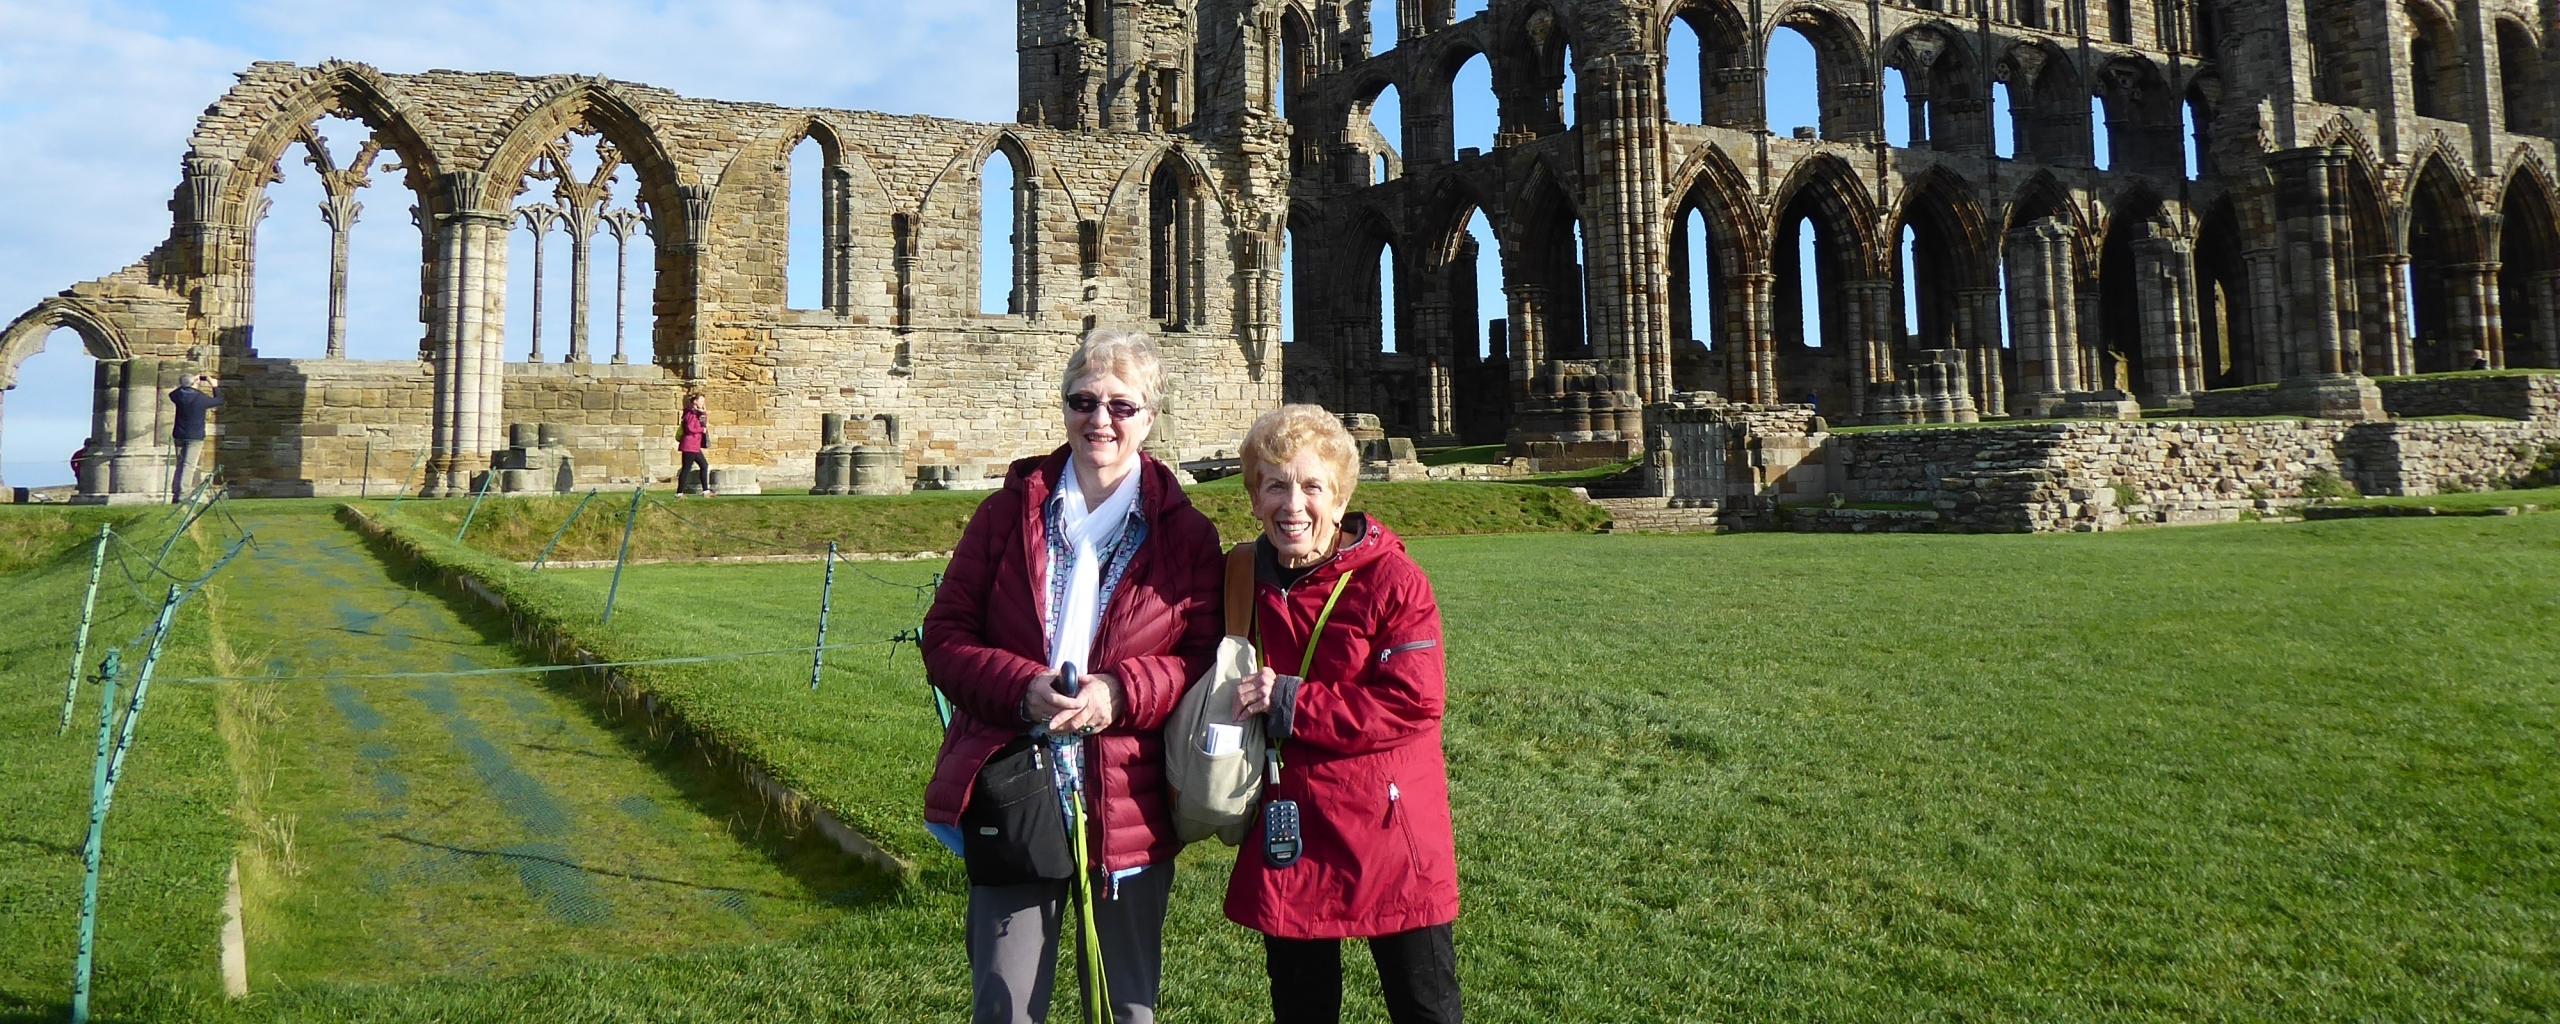 Two OLLI members traveling